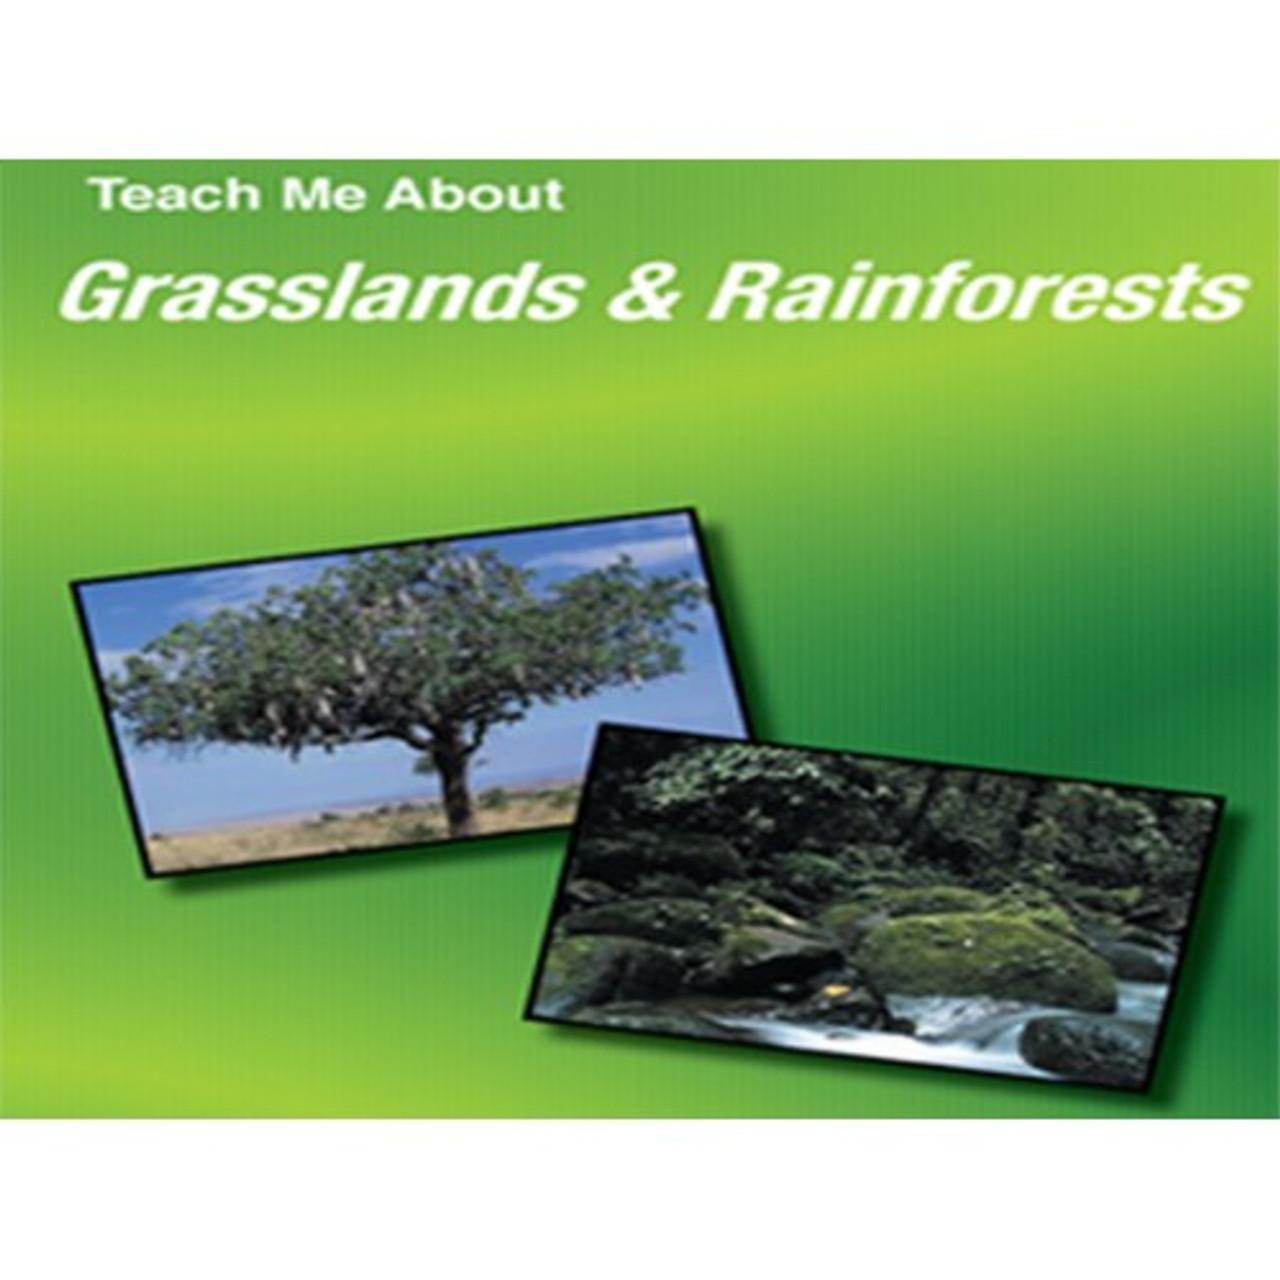 Teach Me About Grasslands and Rainforests